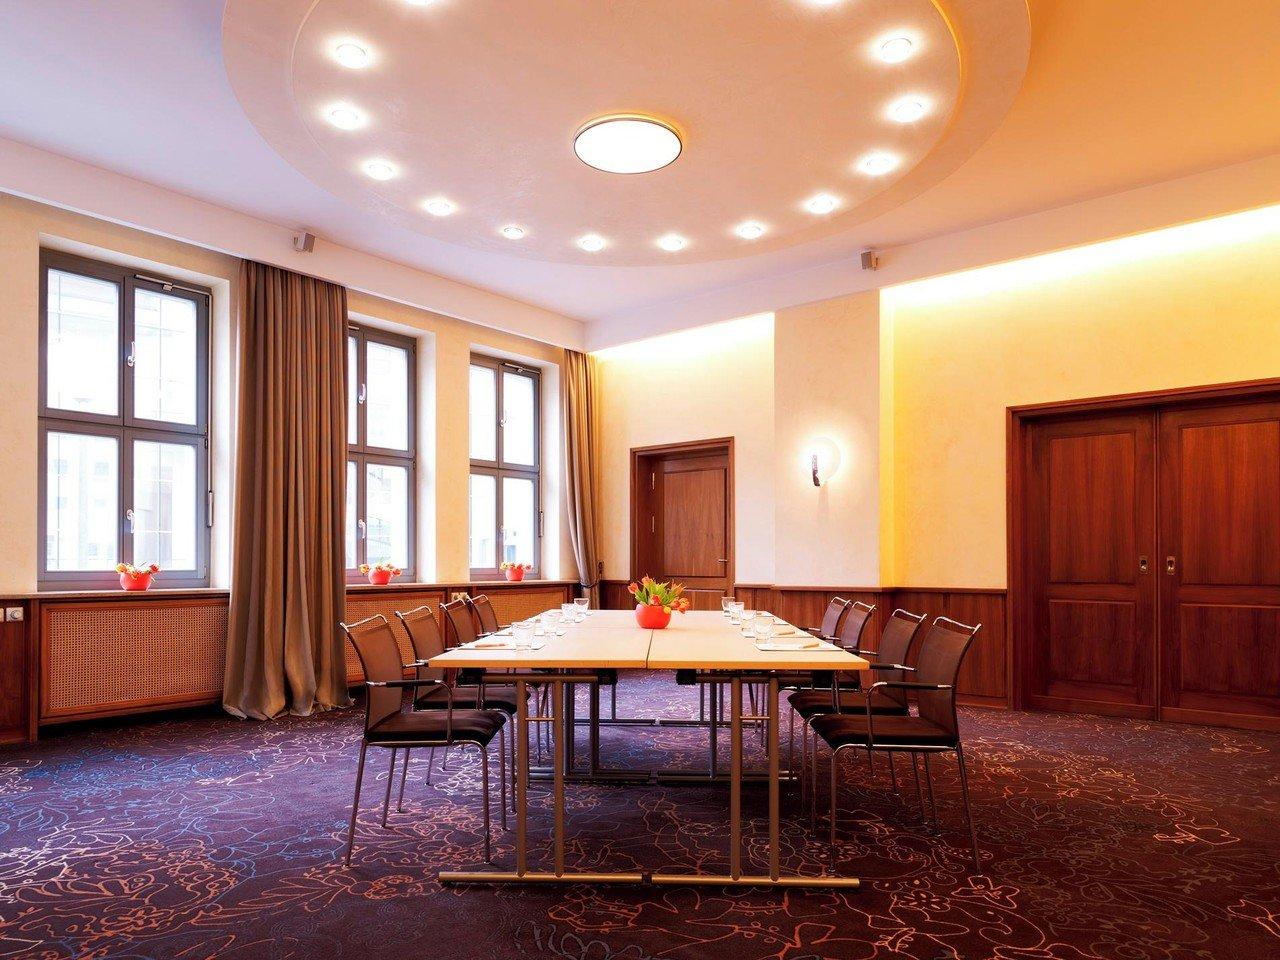 Nürnberg conference rooms Meetingraum Hotel Victoria DenkAnstoß image 1